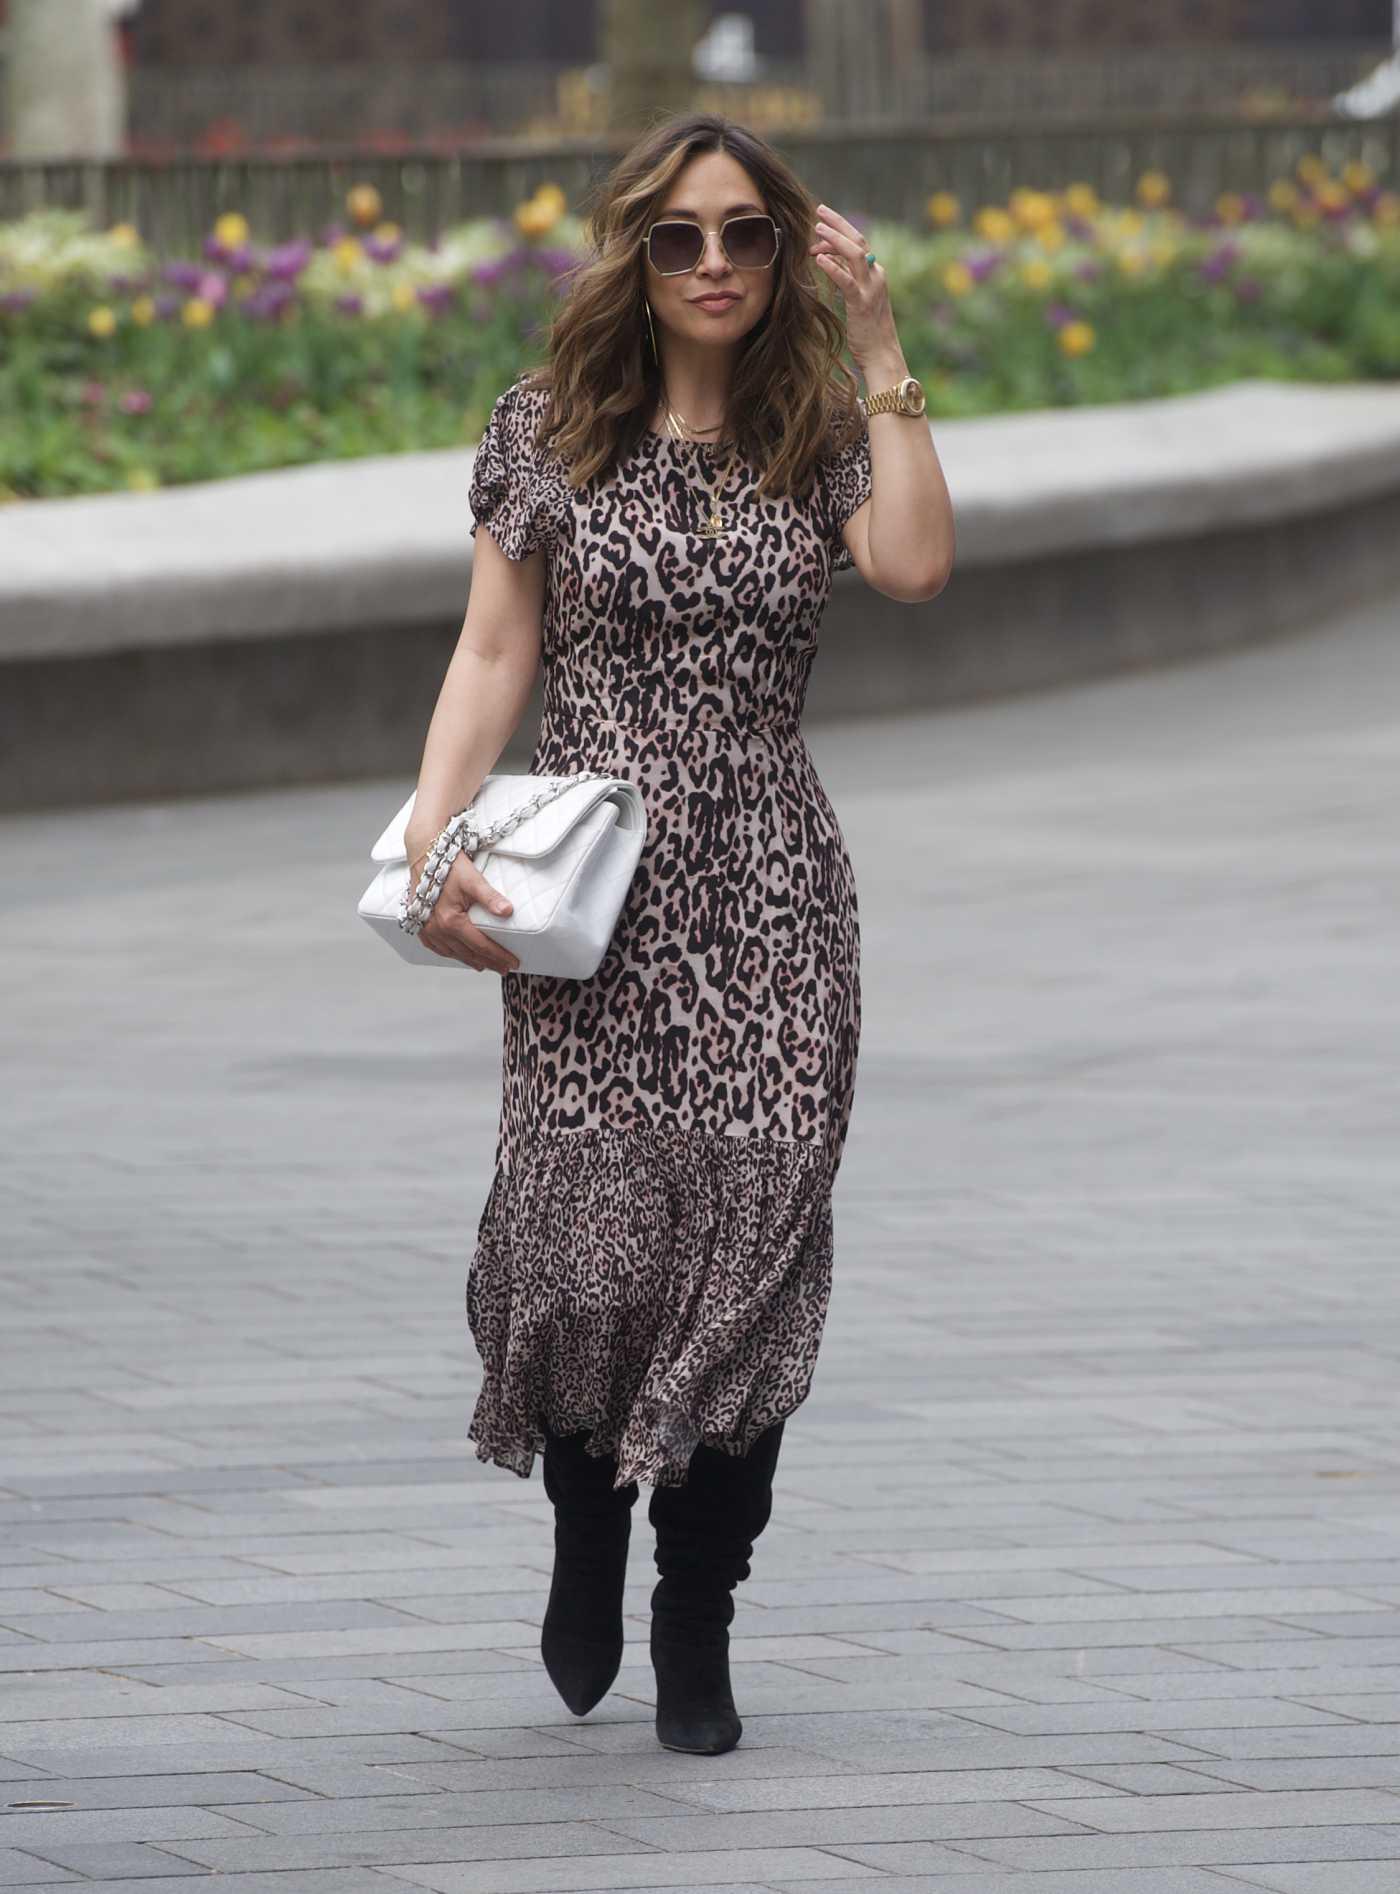 Myleene Klass in an Animal Print Dress Arrives at the Global Radio in London 04/27/2020